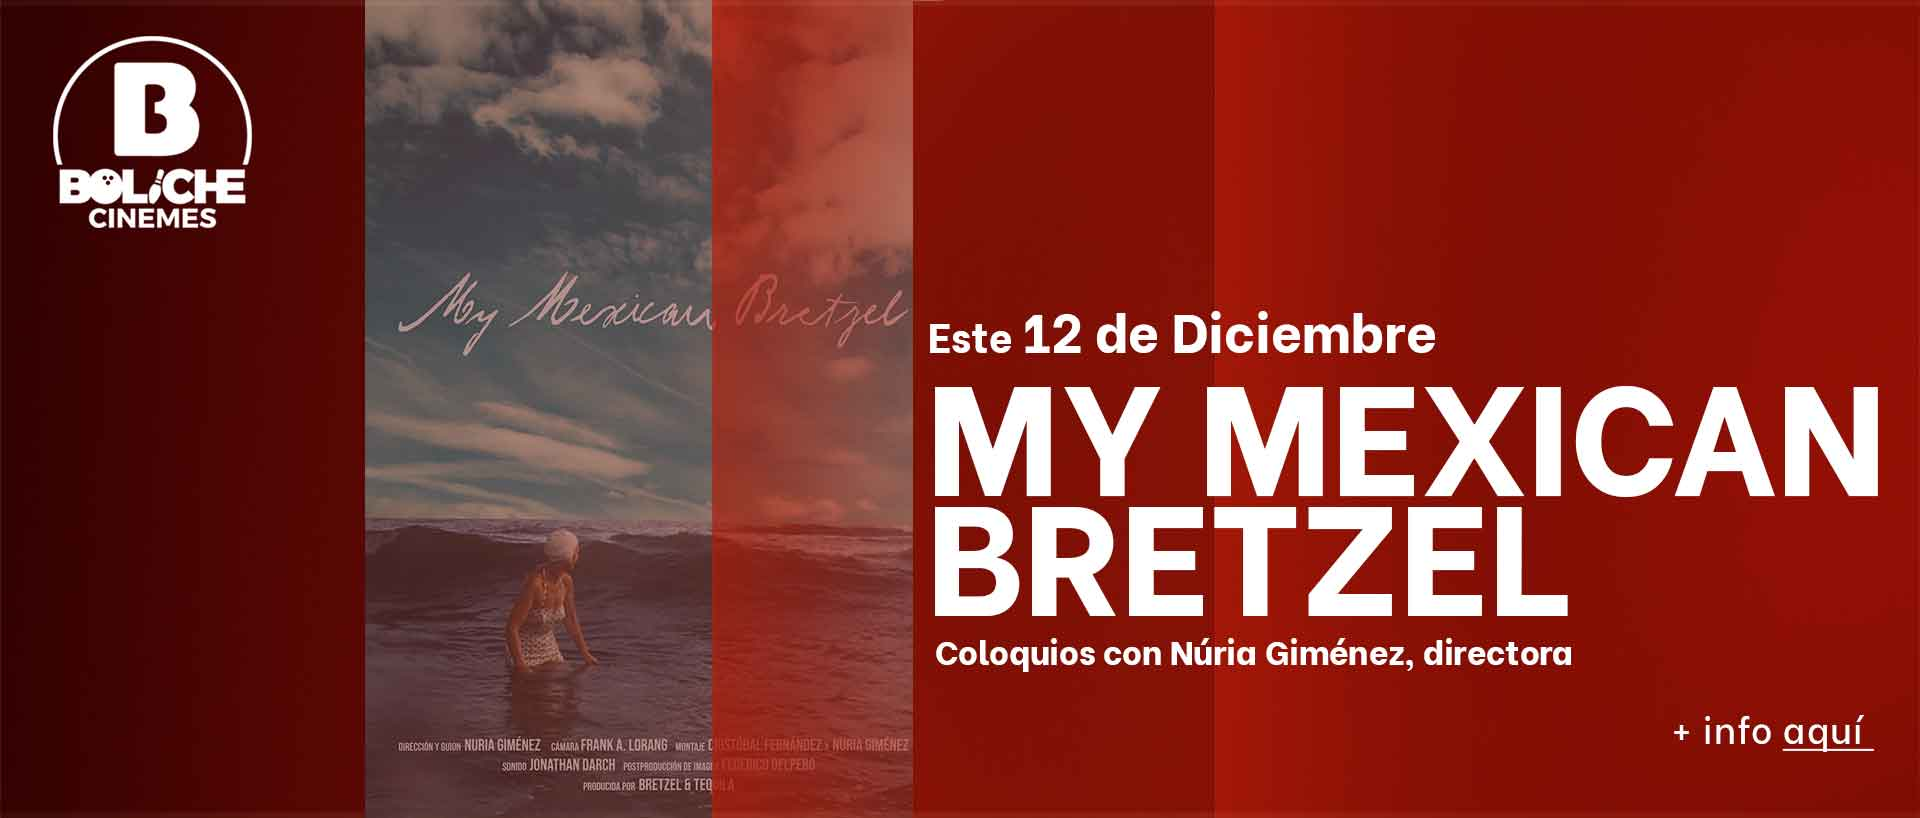 Boliche_MexicanBretzel.jpg